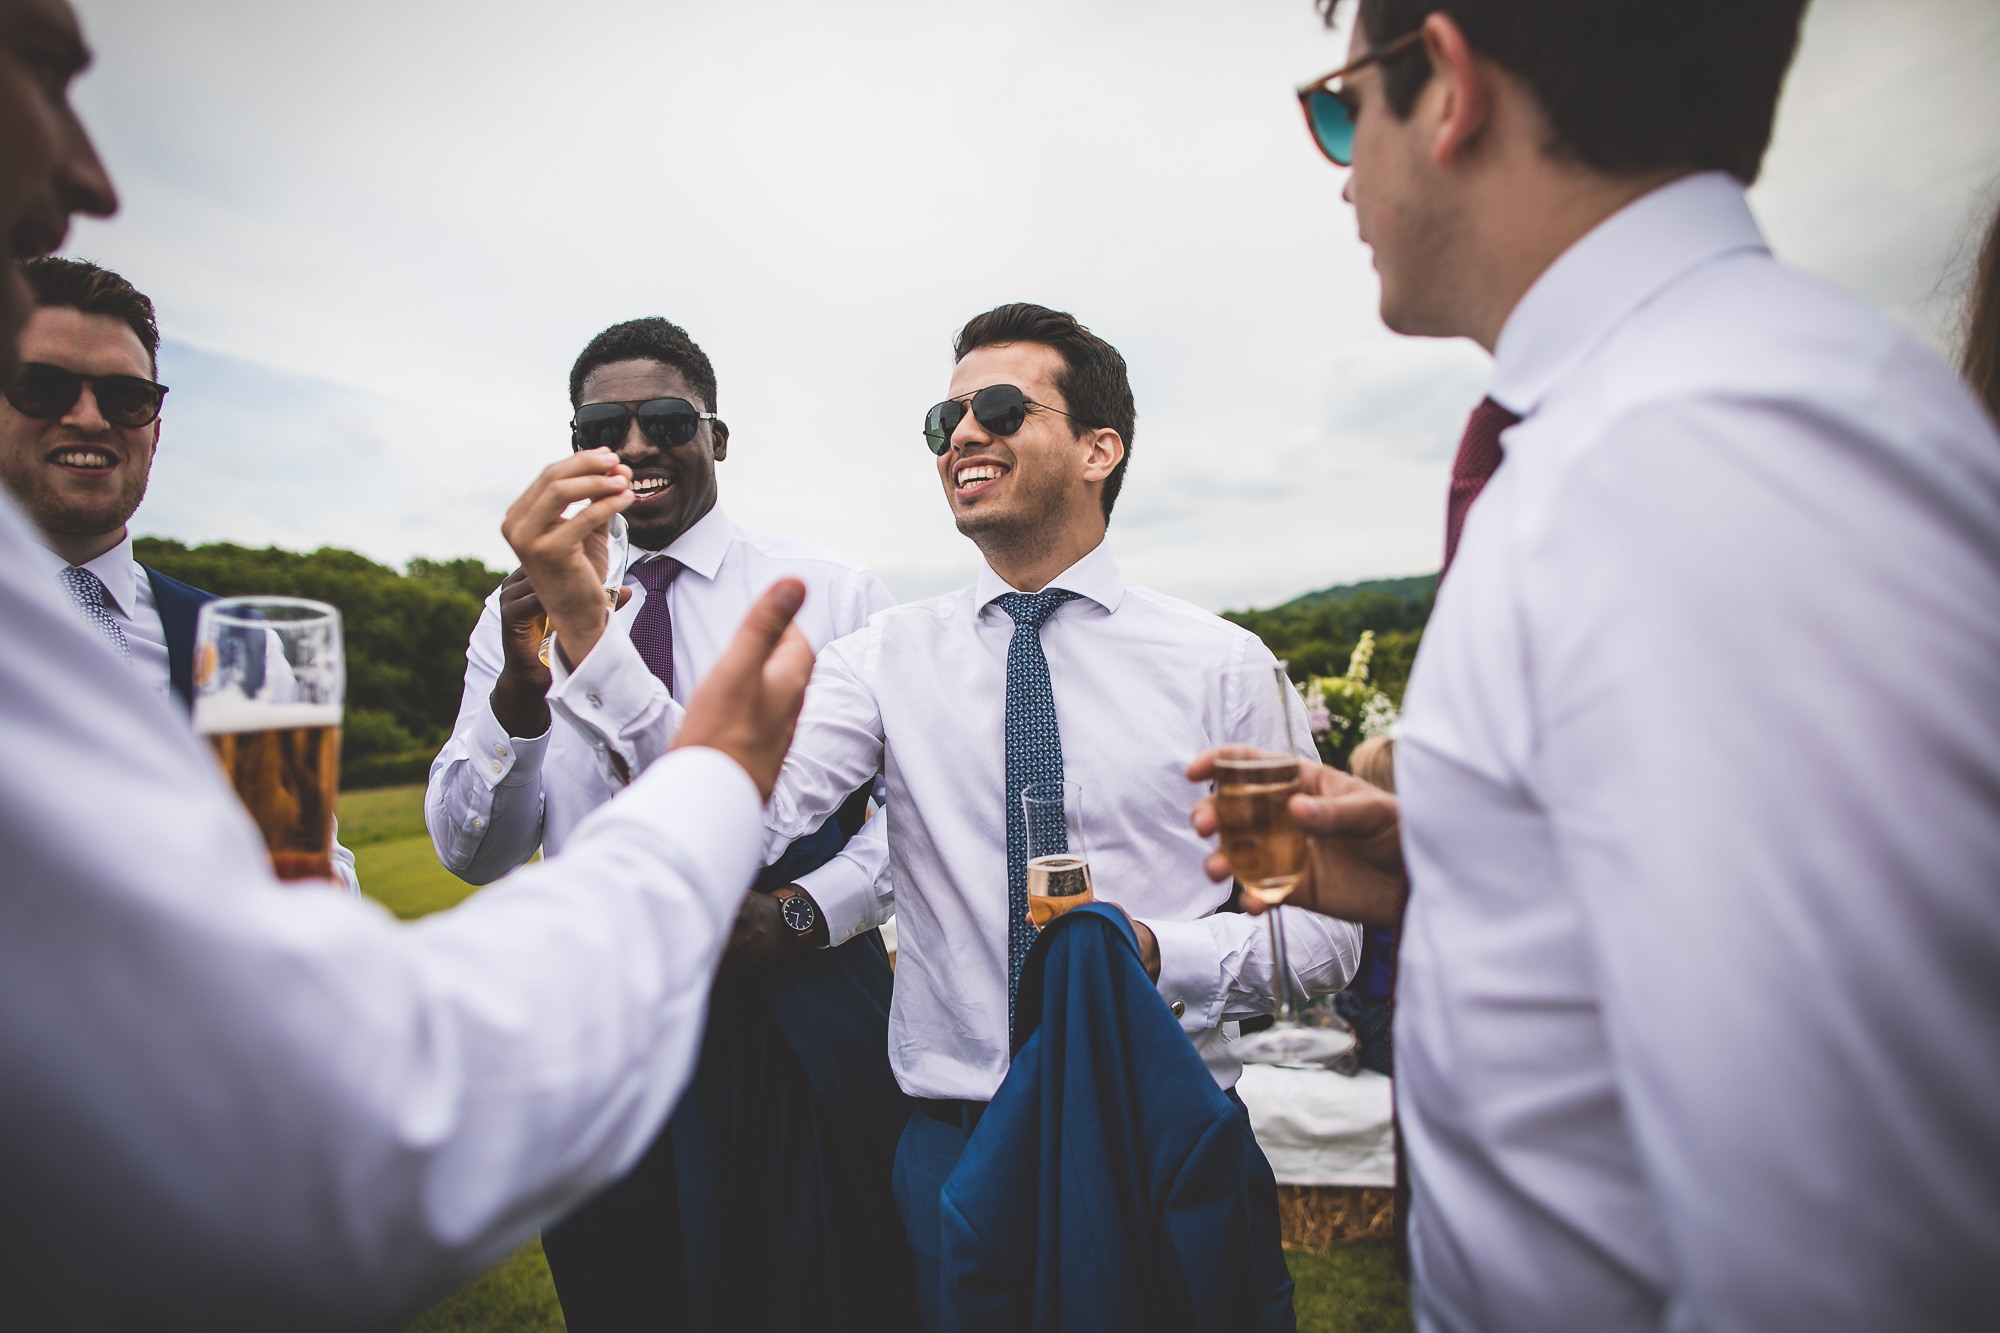 Veils & Bales Wedding Photography | Charlie & Steve SCSS 158